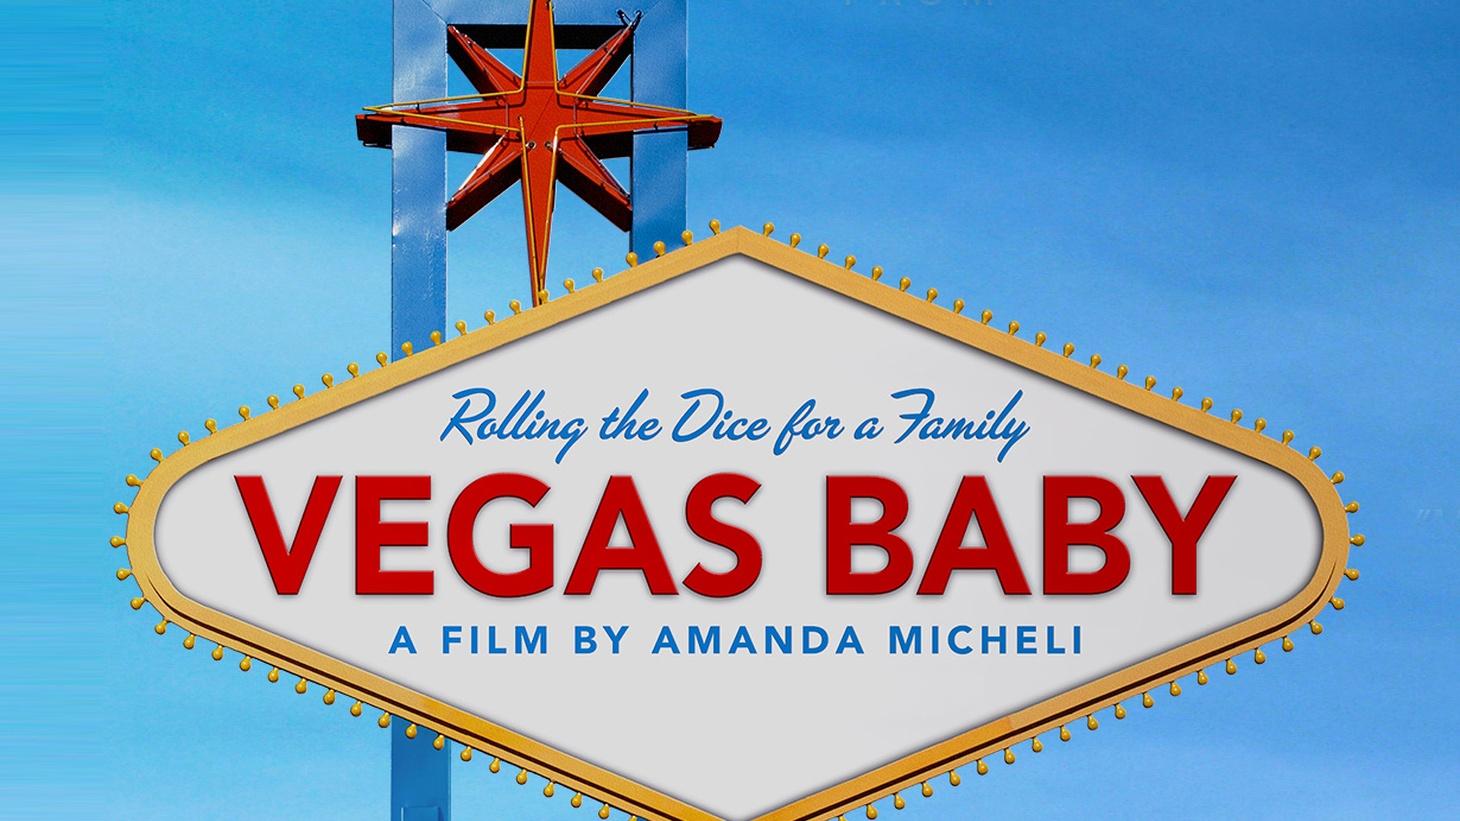 A documentary filmmaker's five-year trip down the rabbit hole of in vitro fertilization.